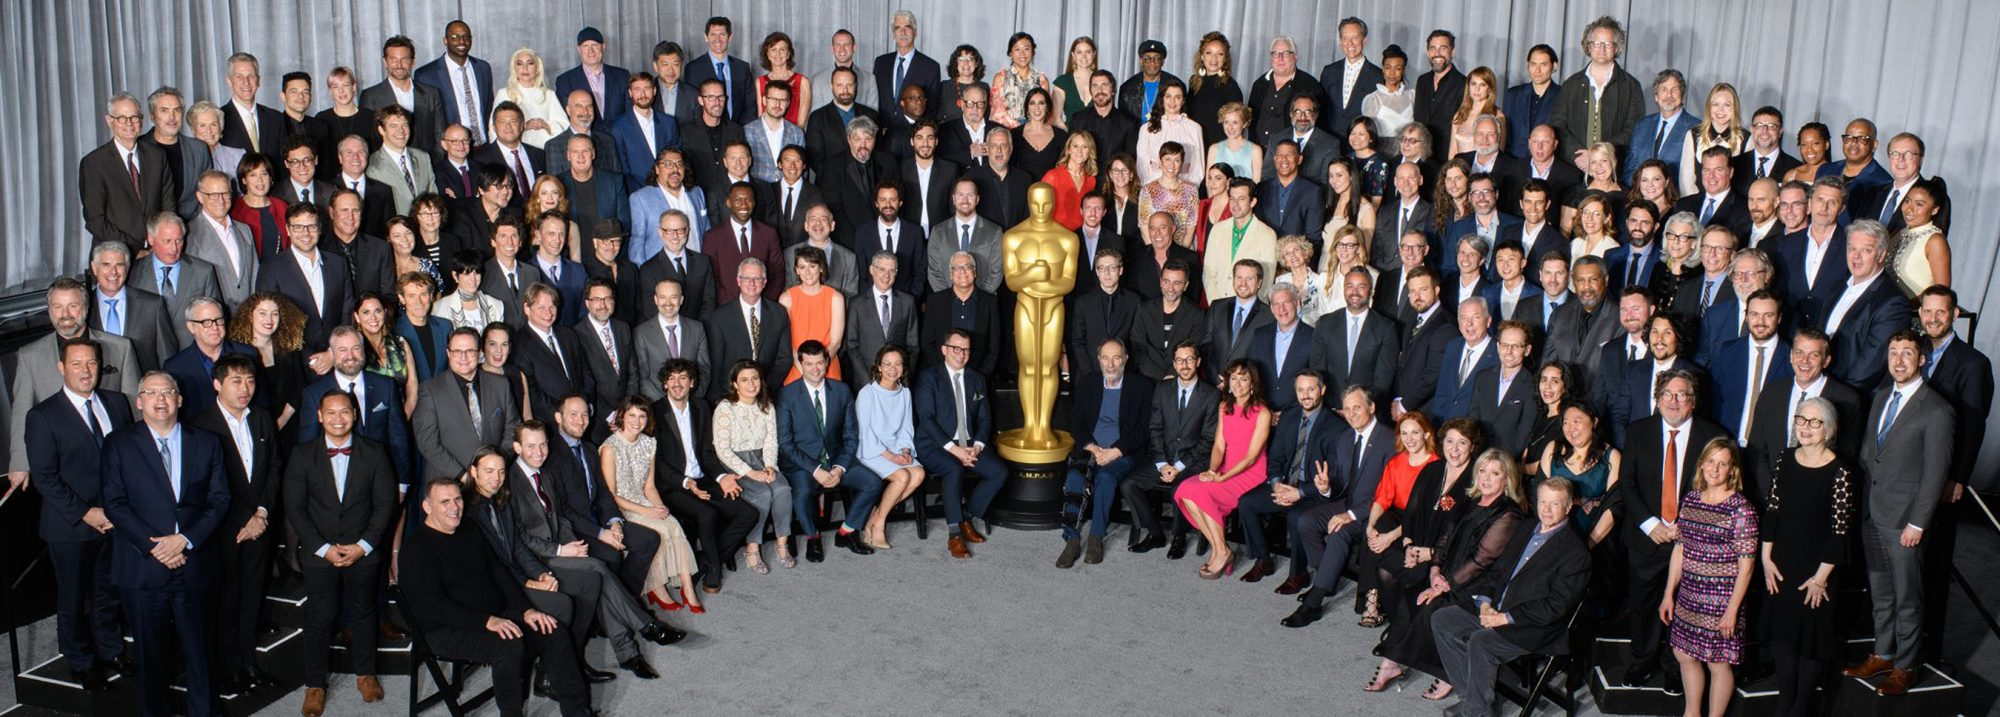 oscars-nominees-class